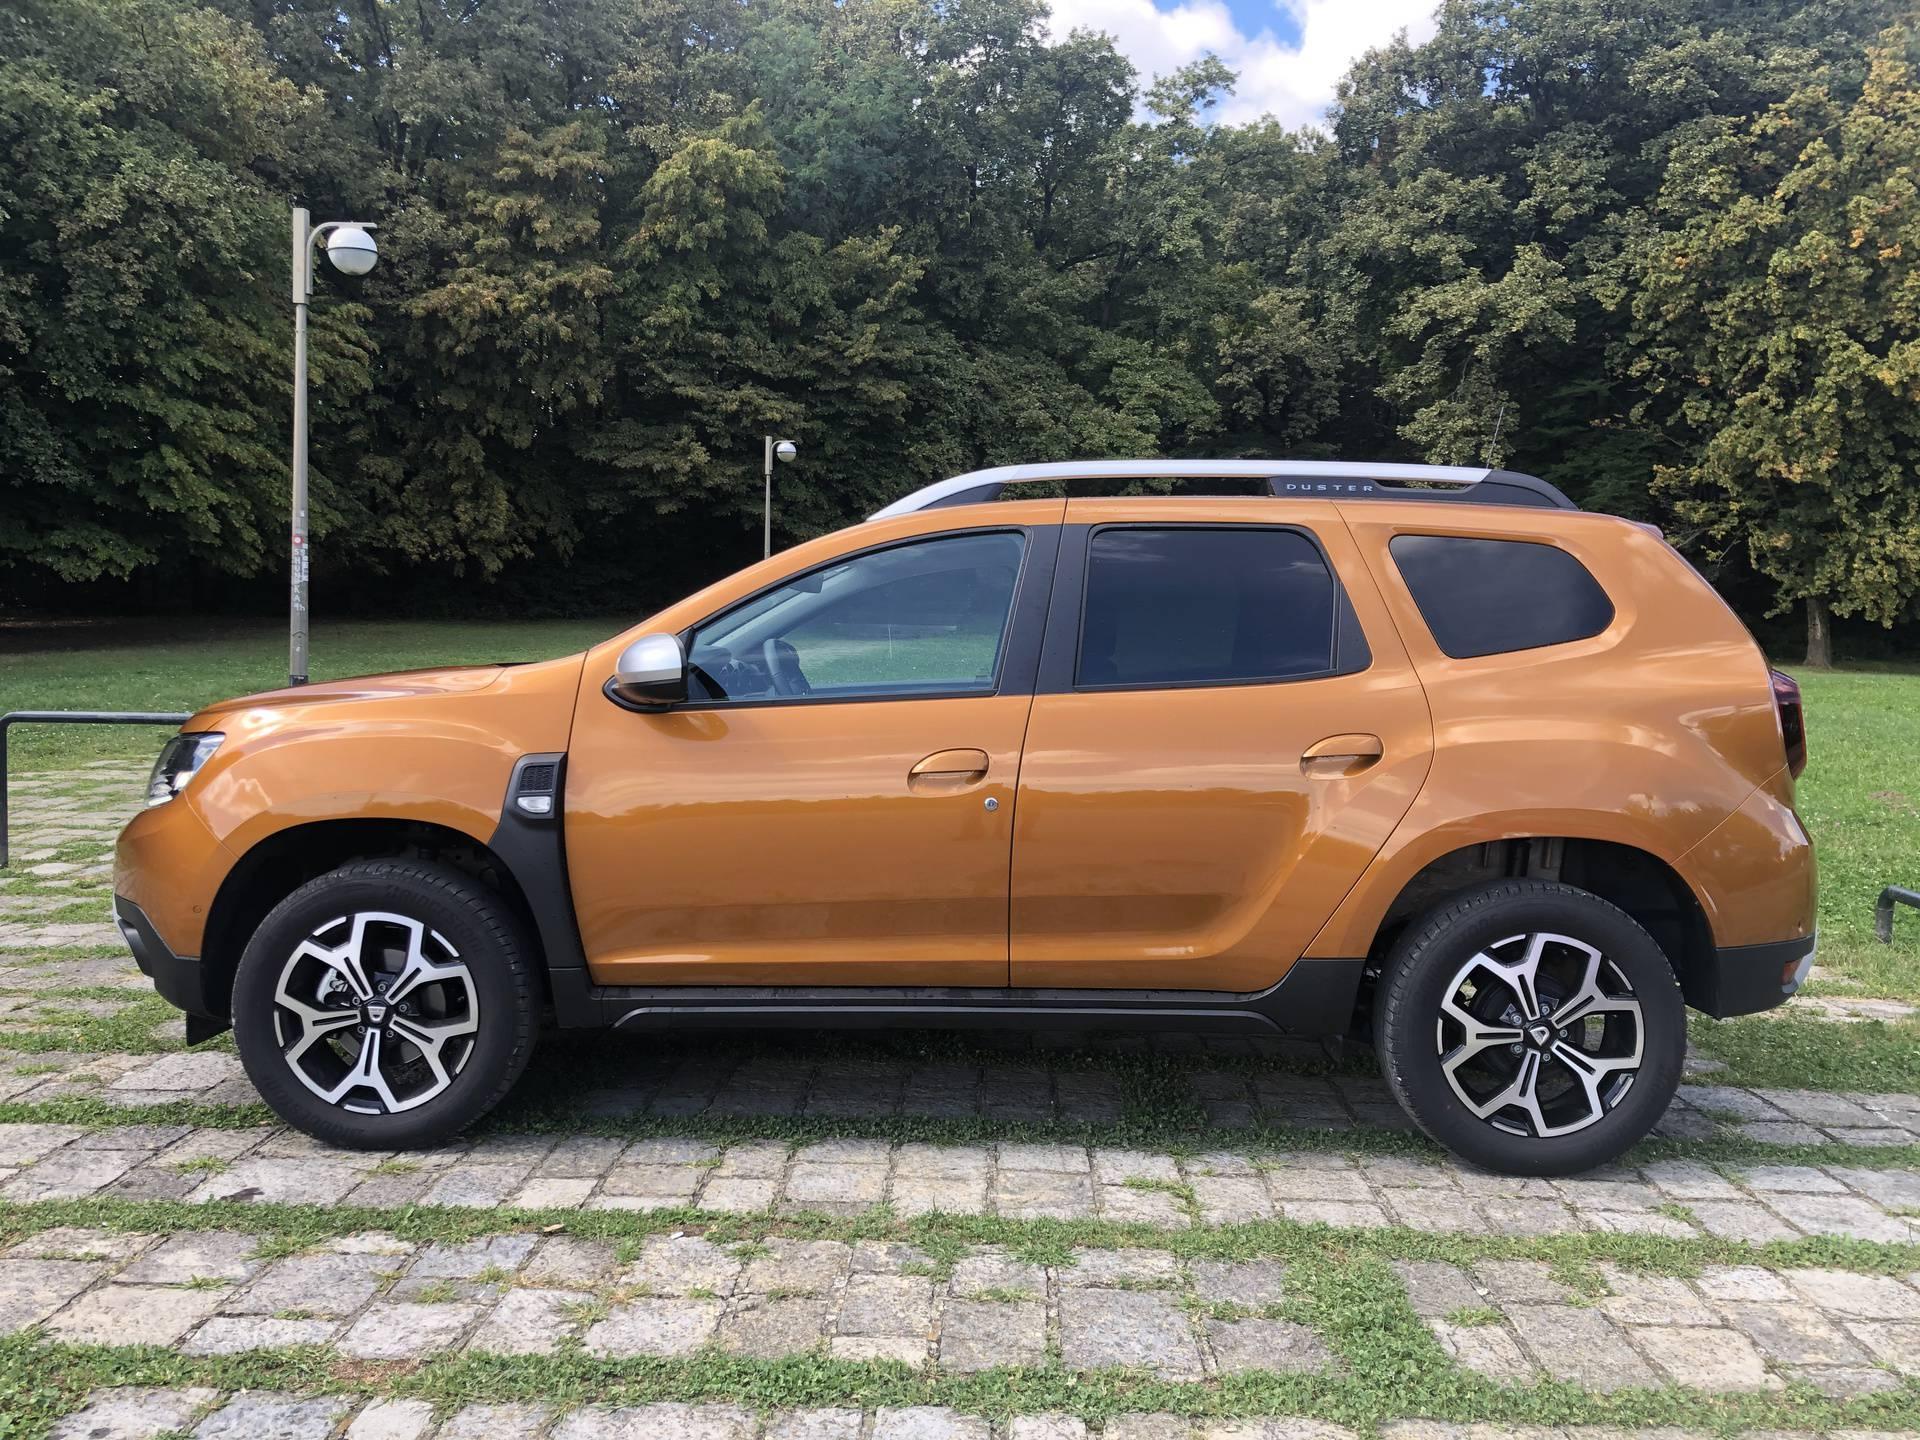 Dacia Duster na plin je jeftin i vrlo štedljiv kompaktni SUV